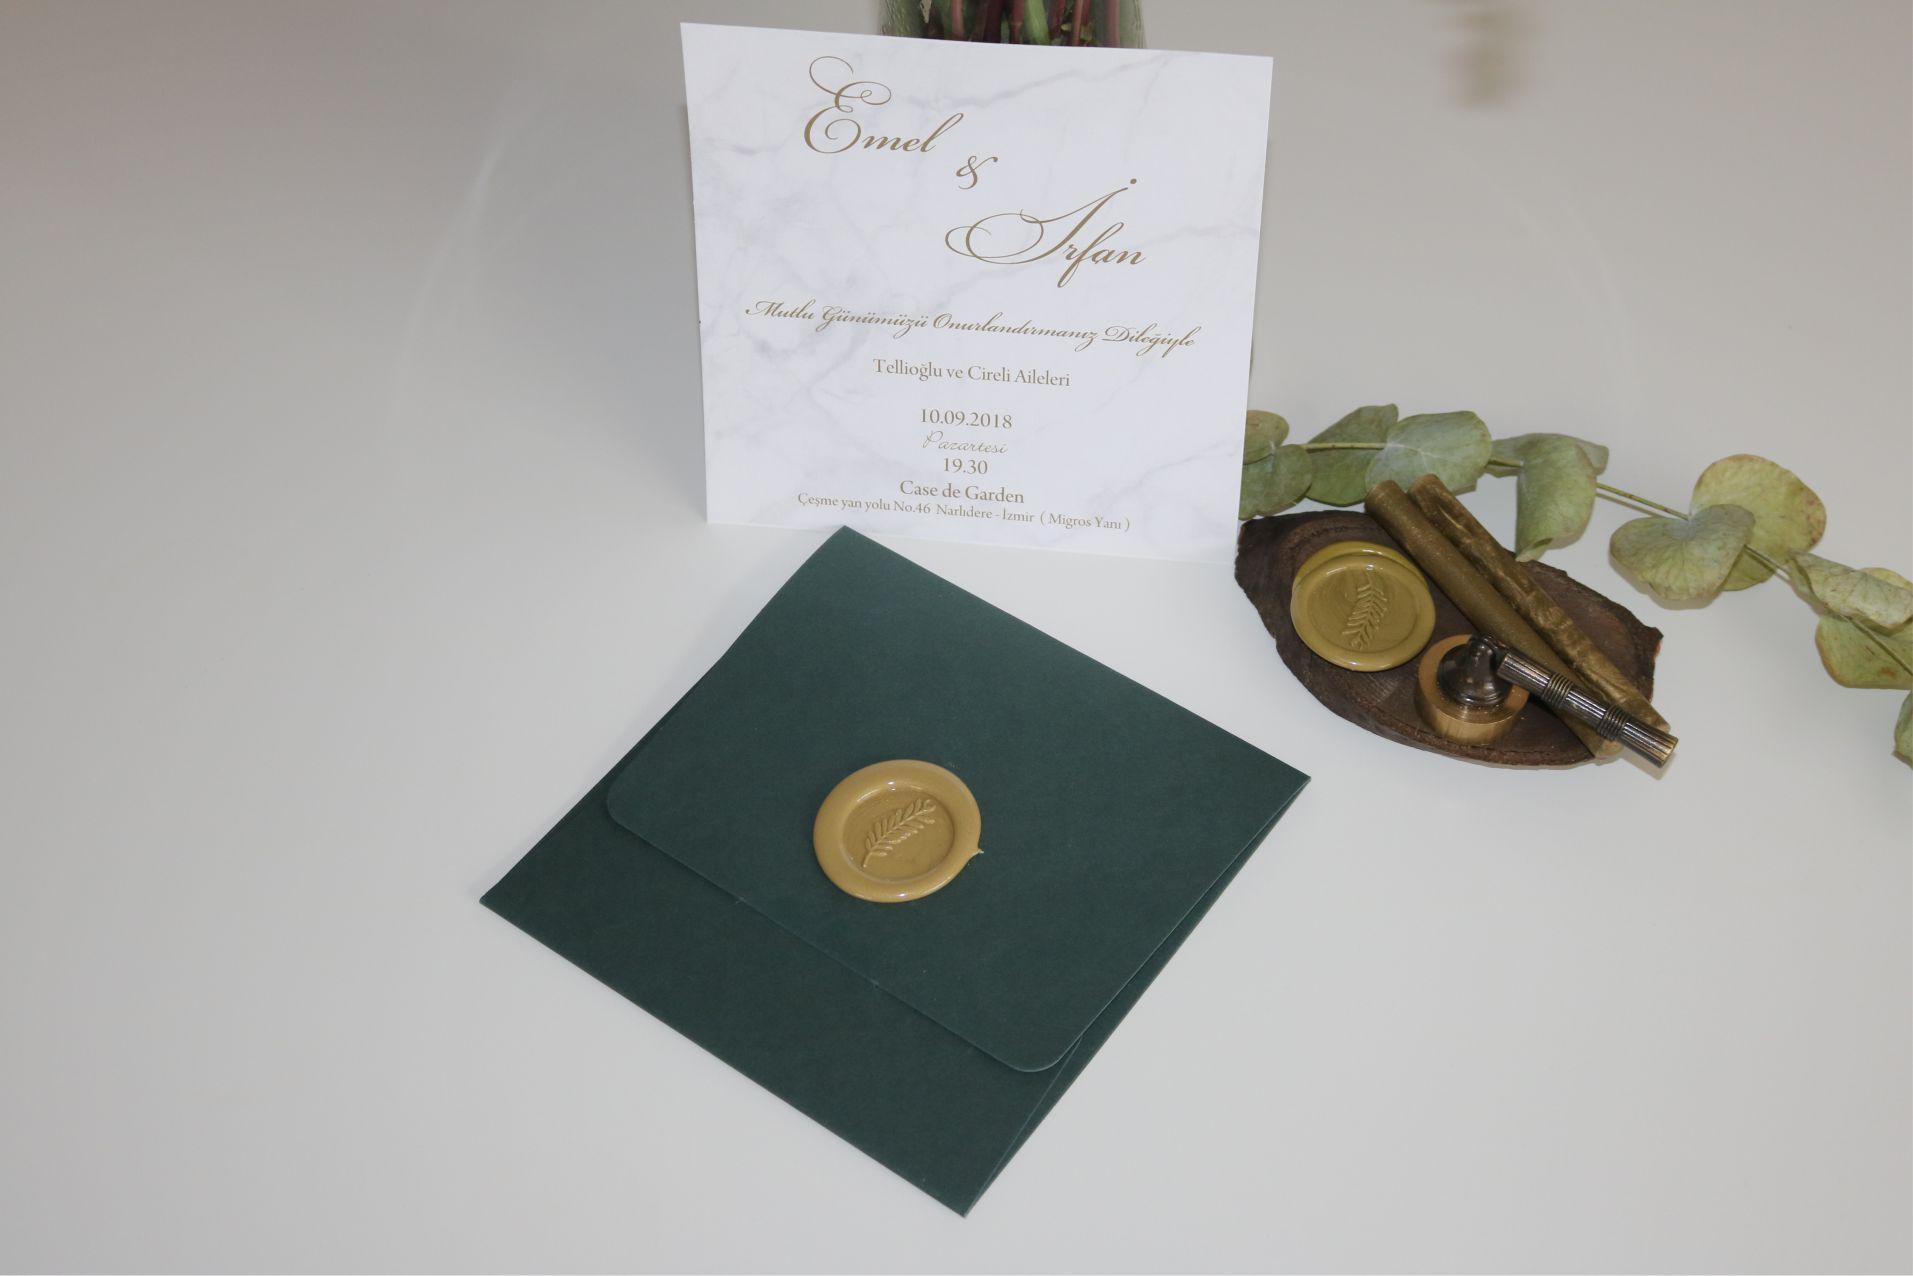 Yeşil Mermer Desenli Davetiye